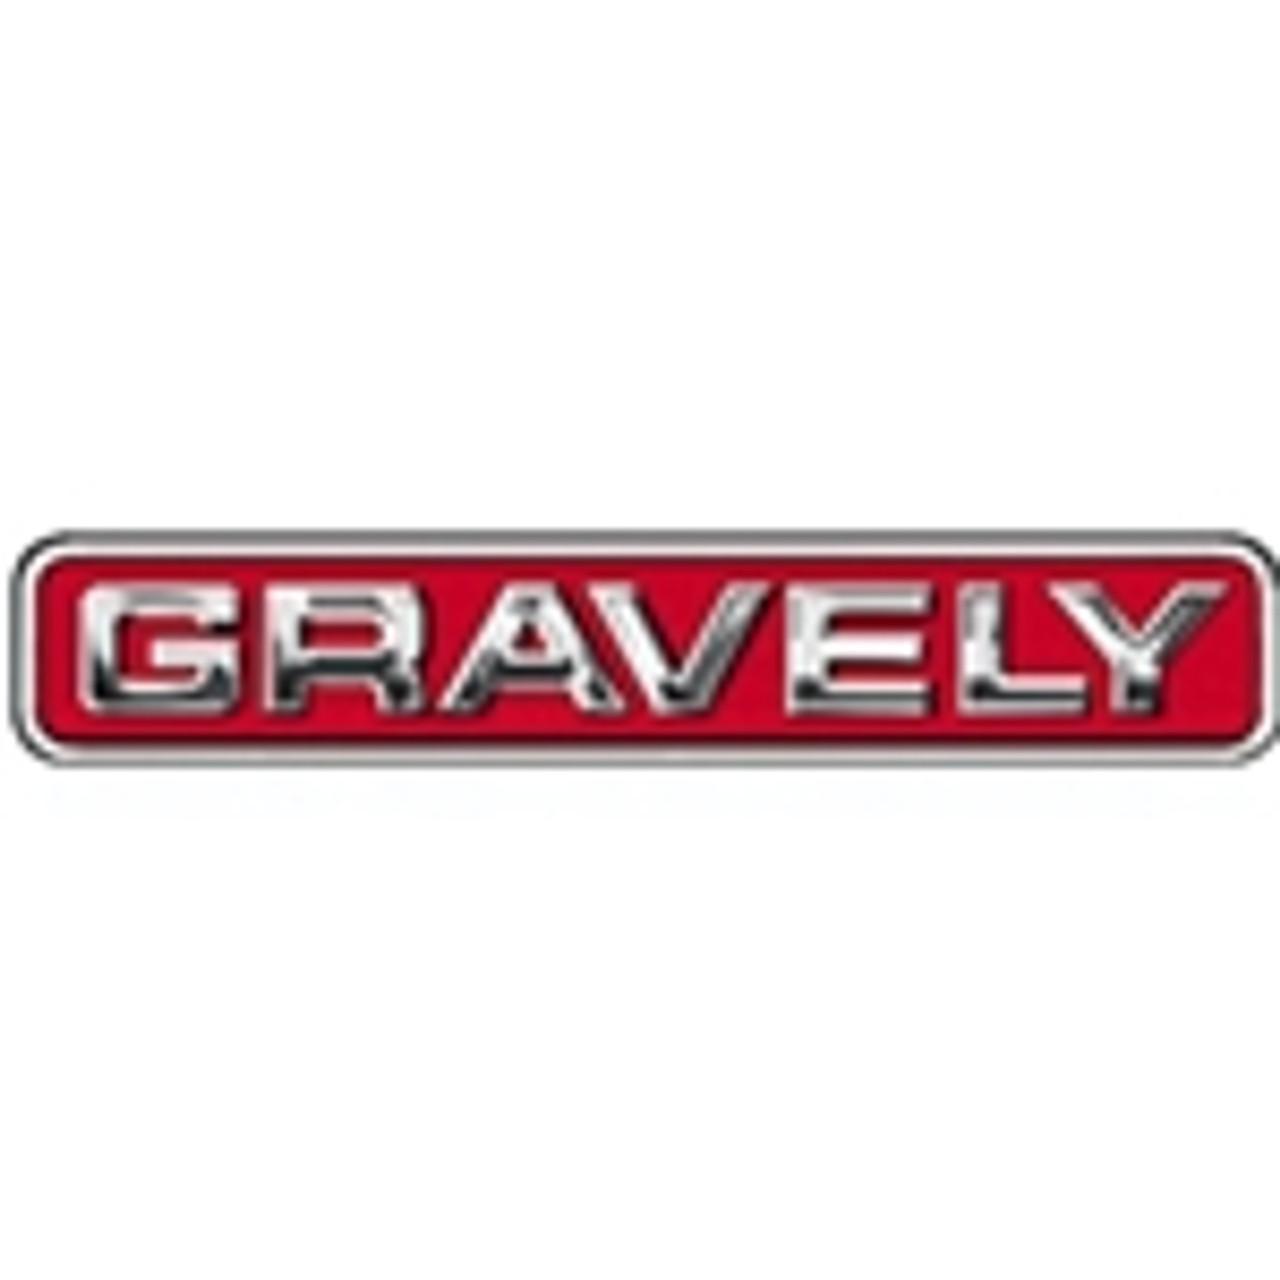 Gravely